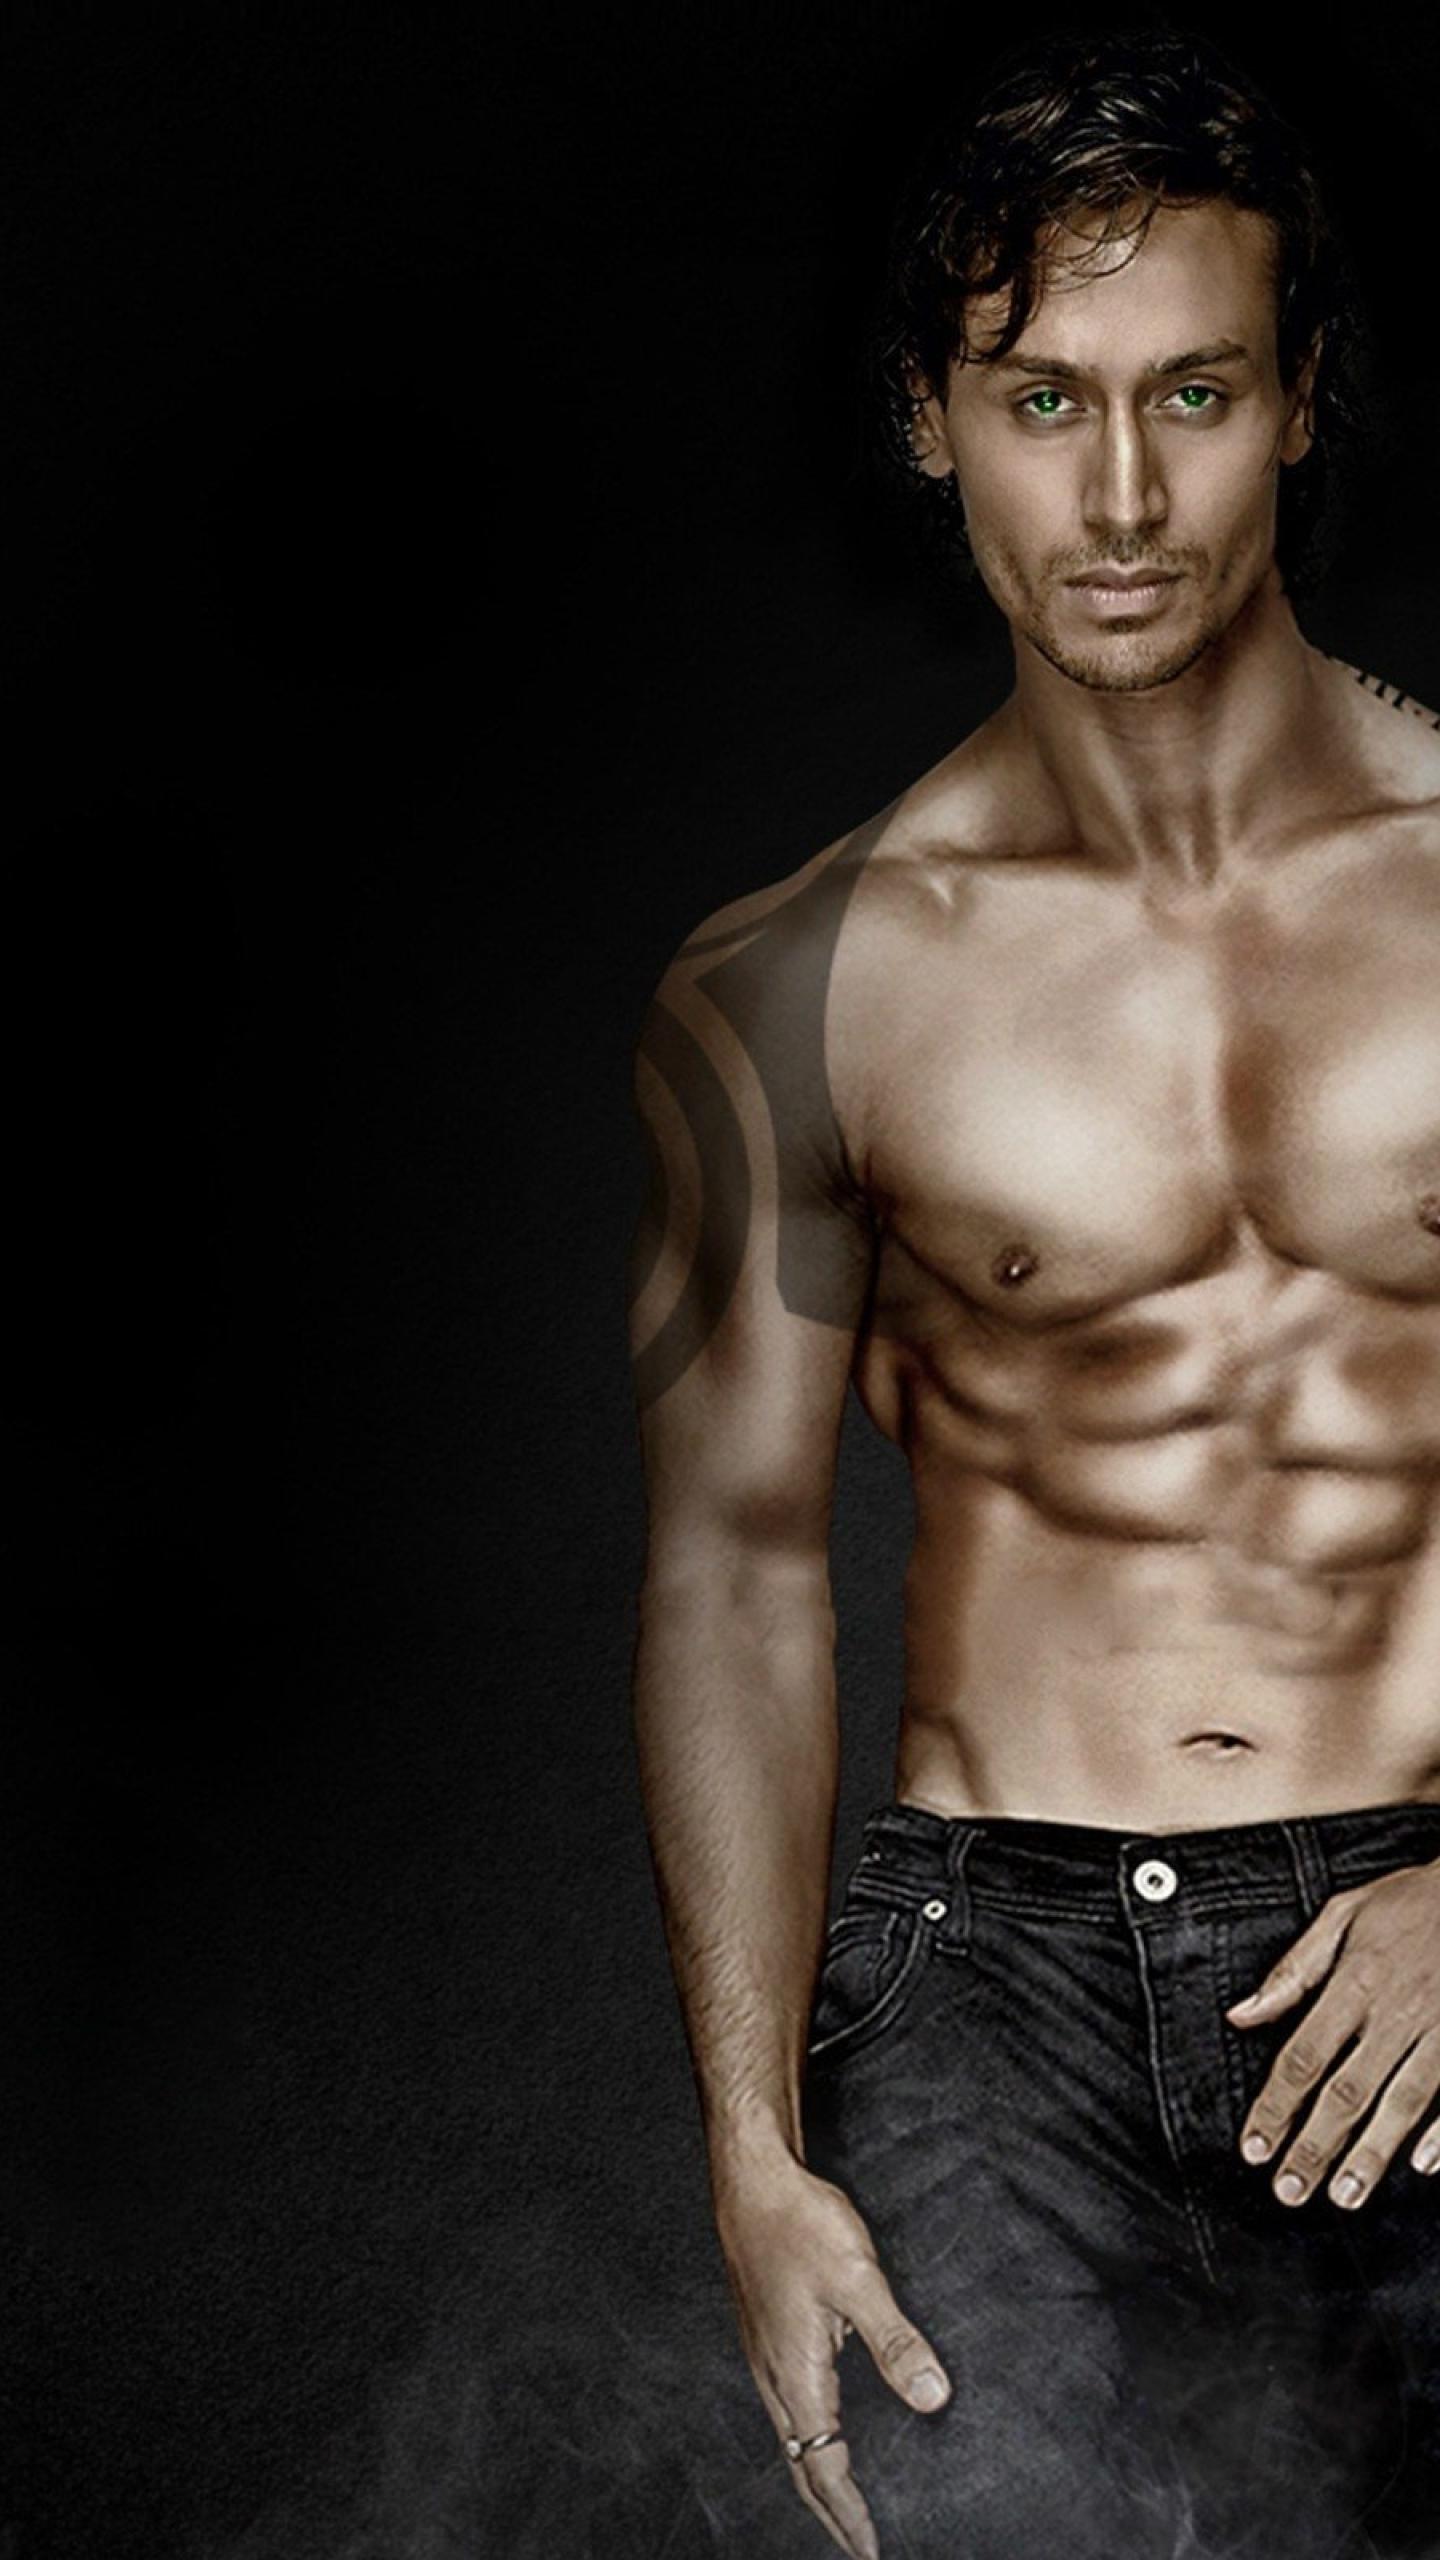 Tiger Shroff Body Photoshoot, Full HD 2K Wallpaper Wallpaper Hd For Mobile Samsung Galaxy S4